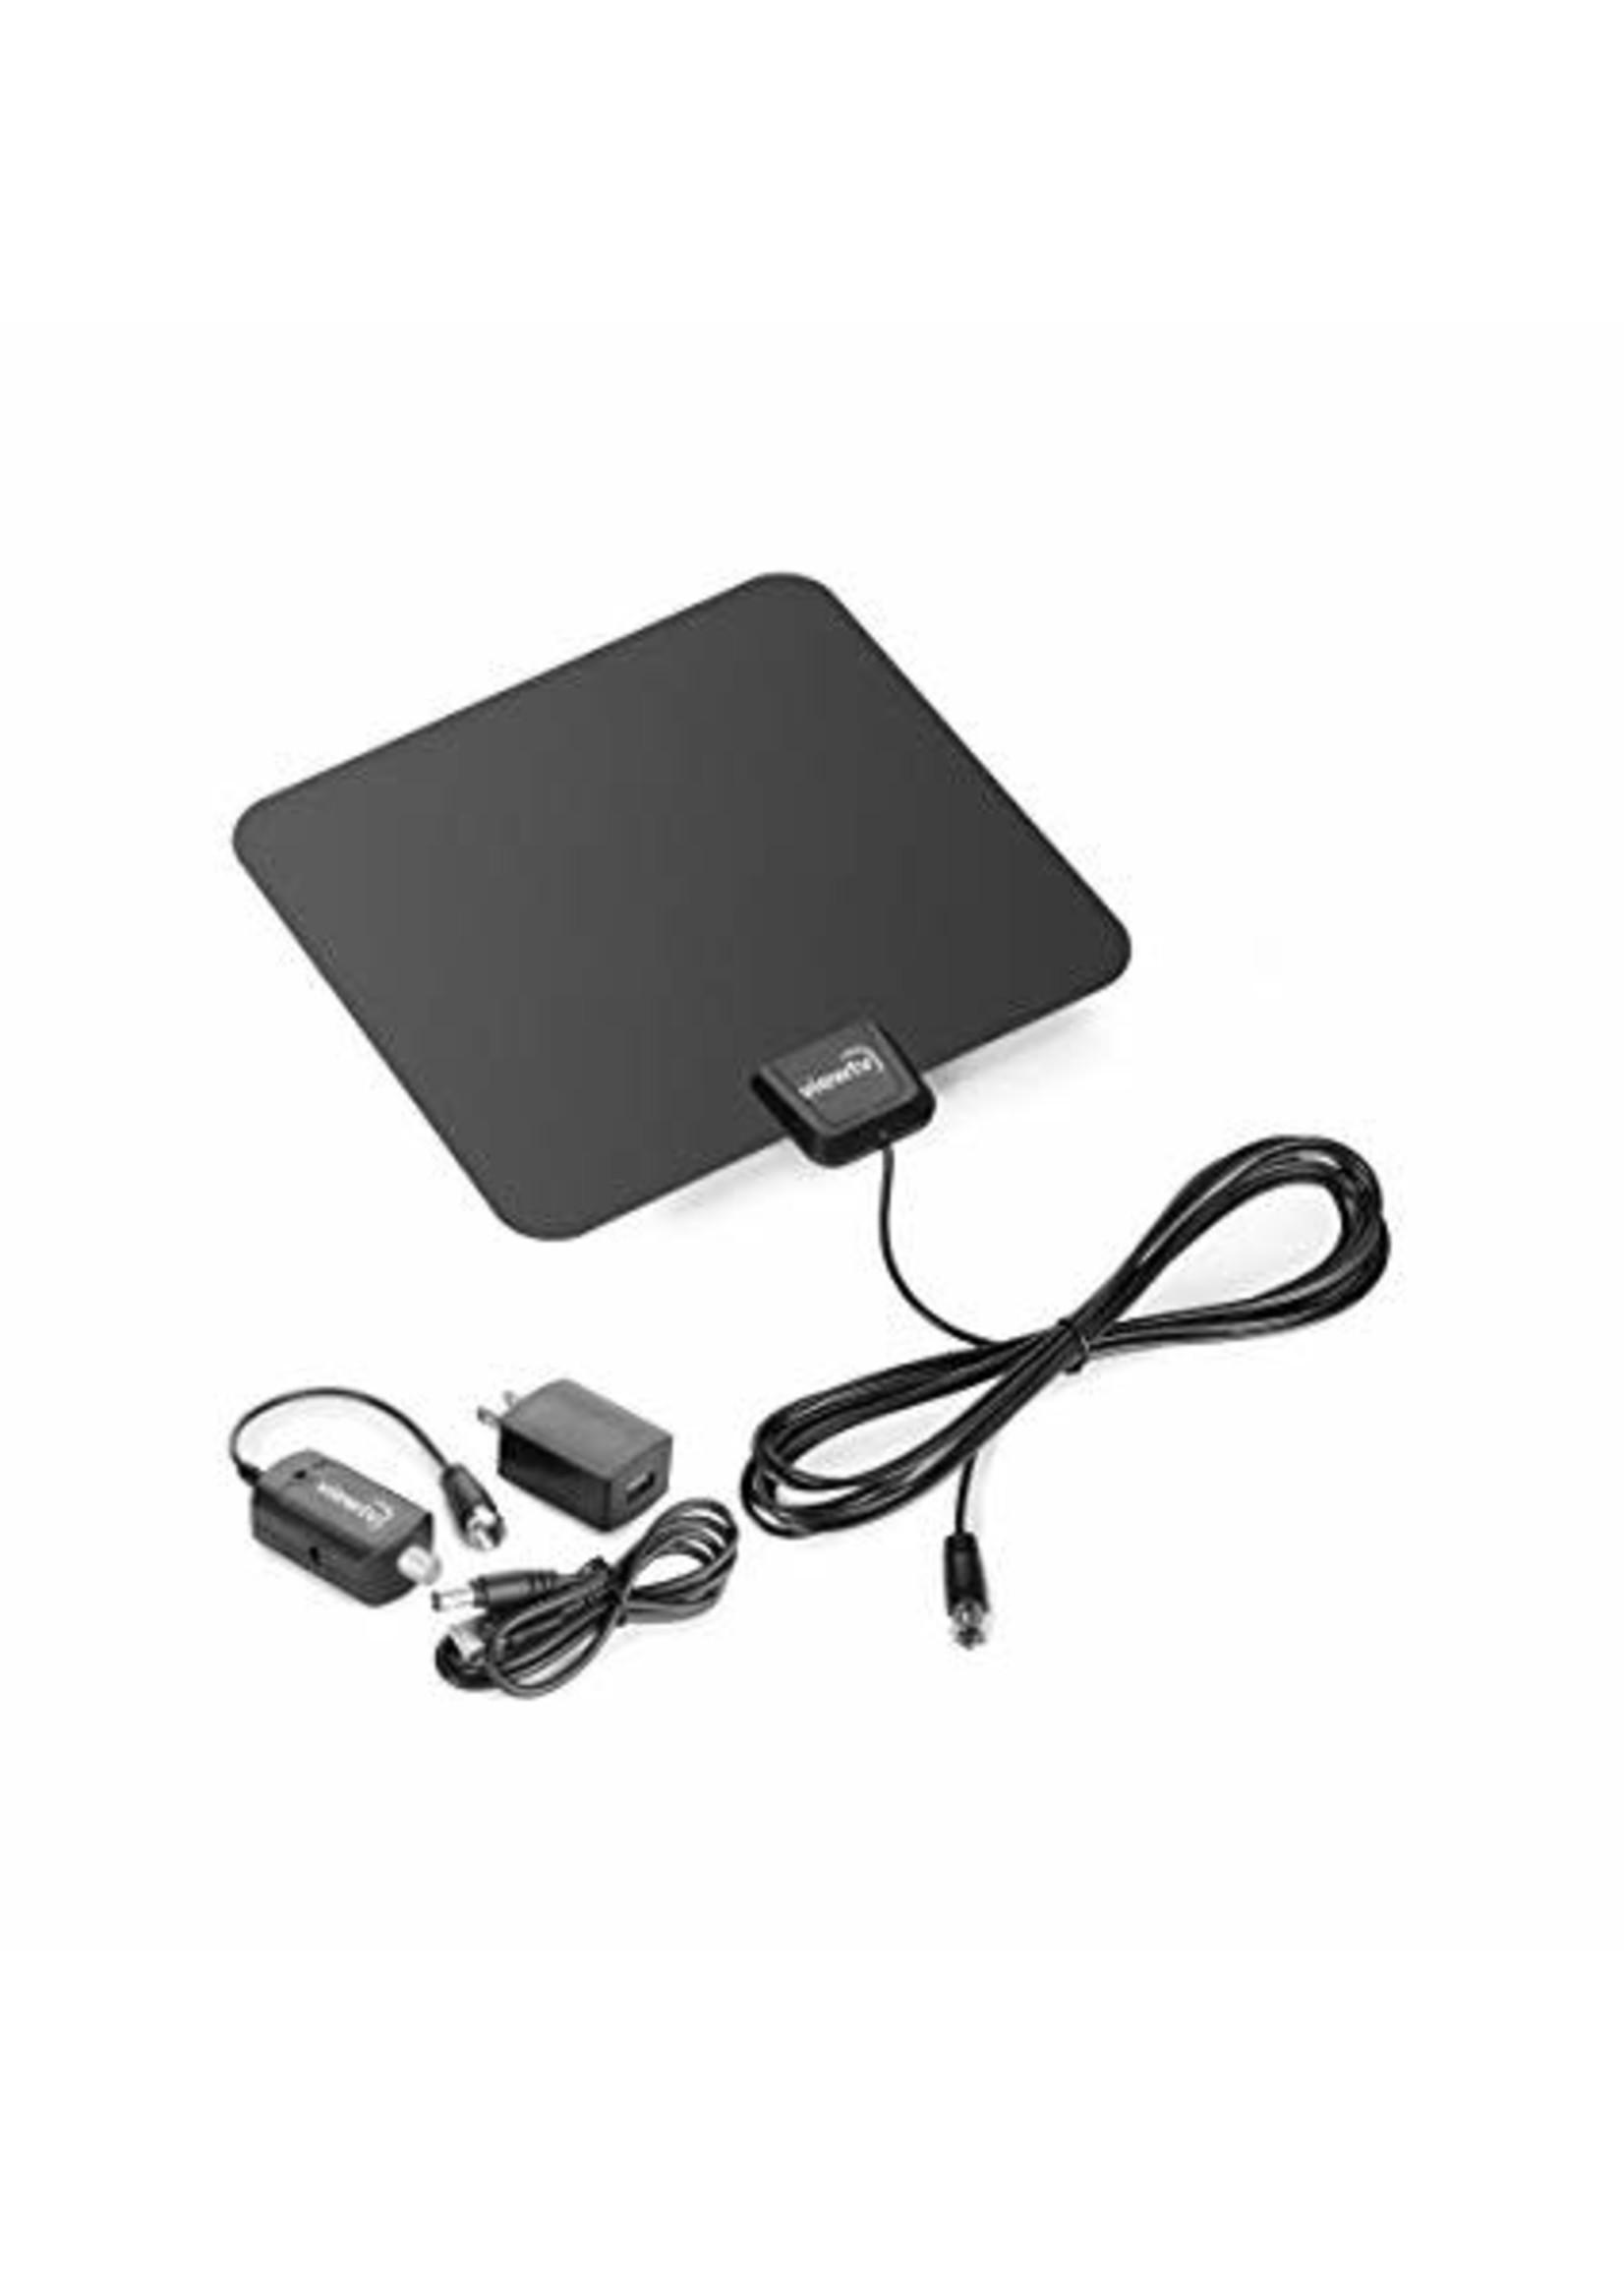 Amazon Digital Indoor Amplified TV Antenna HDTV with Amplifier VHF/UHF